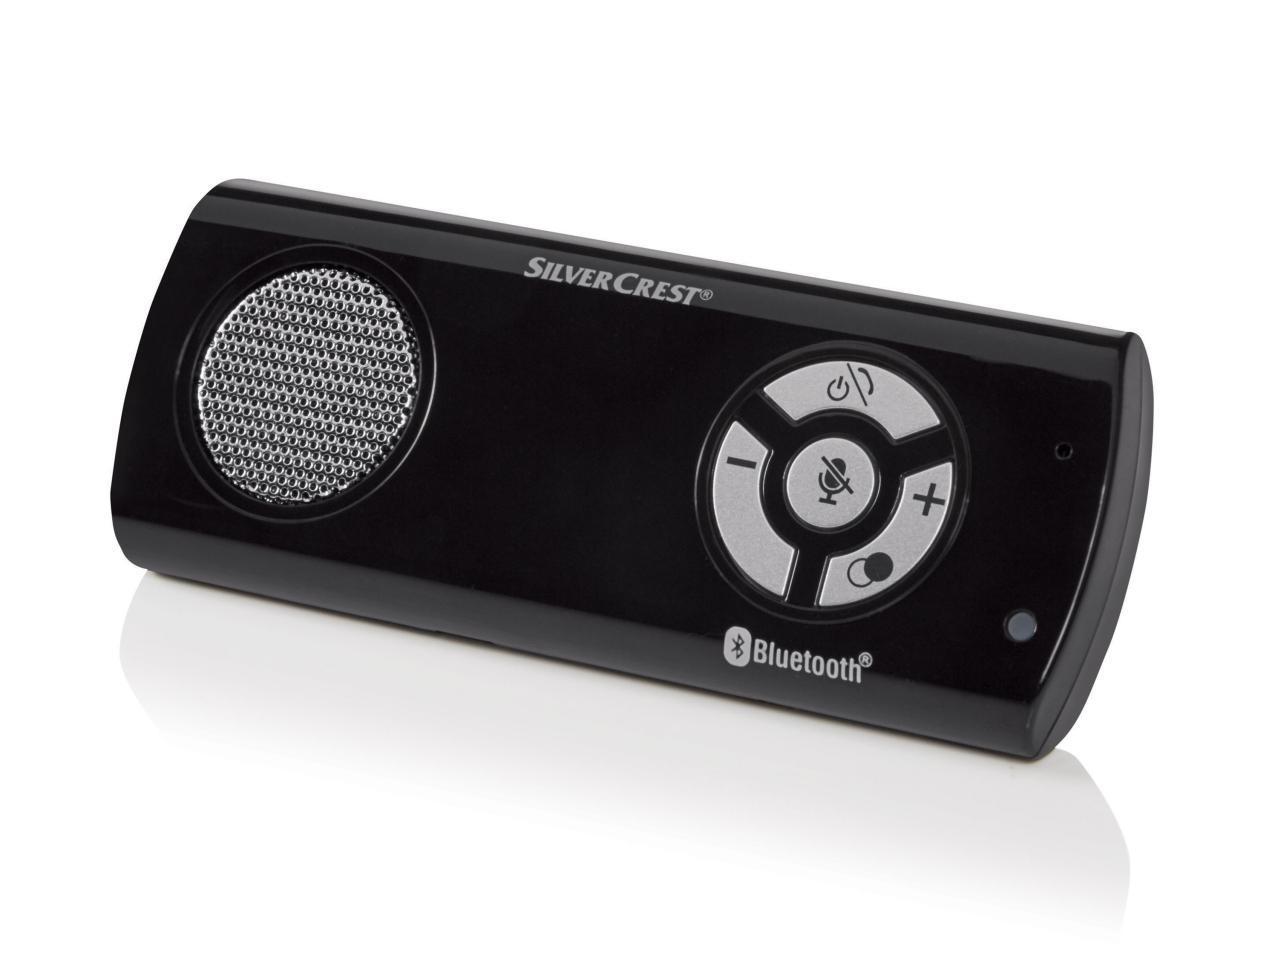 Kit mains libres Bluetooth SilverCrest